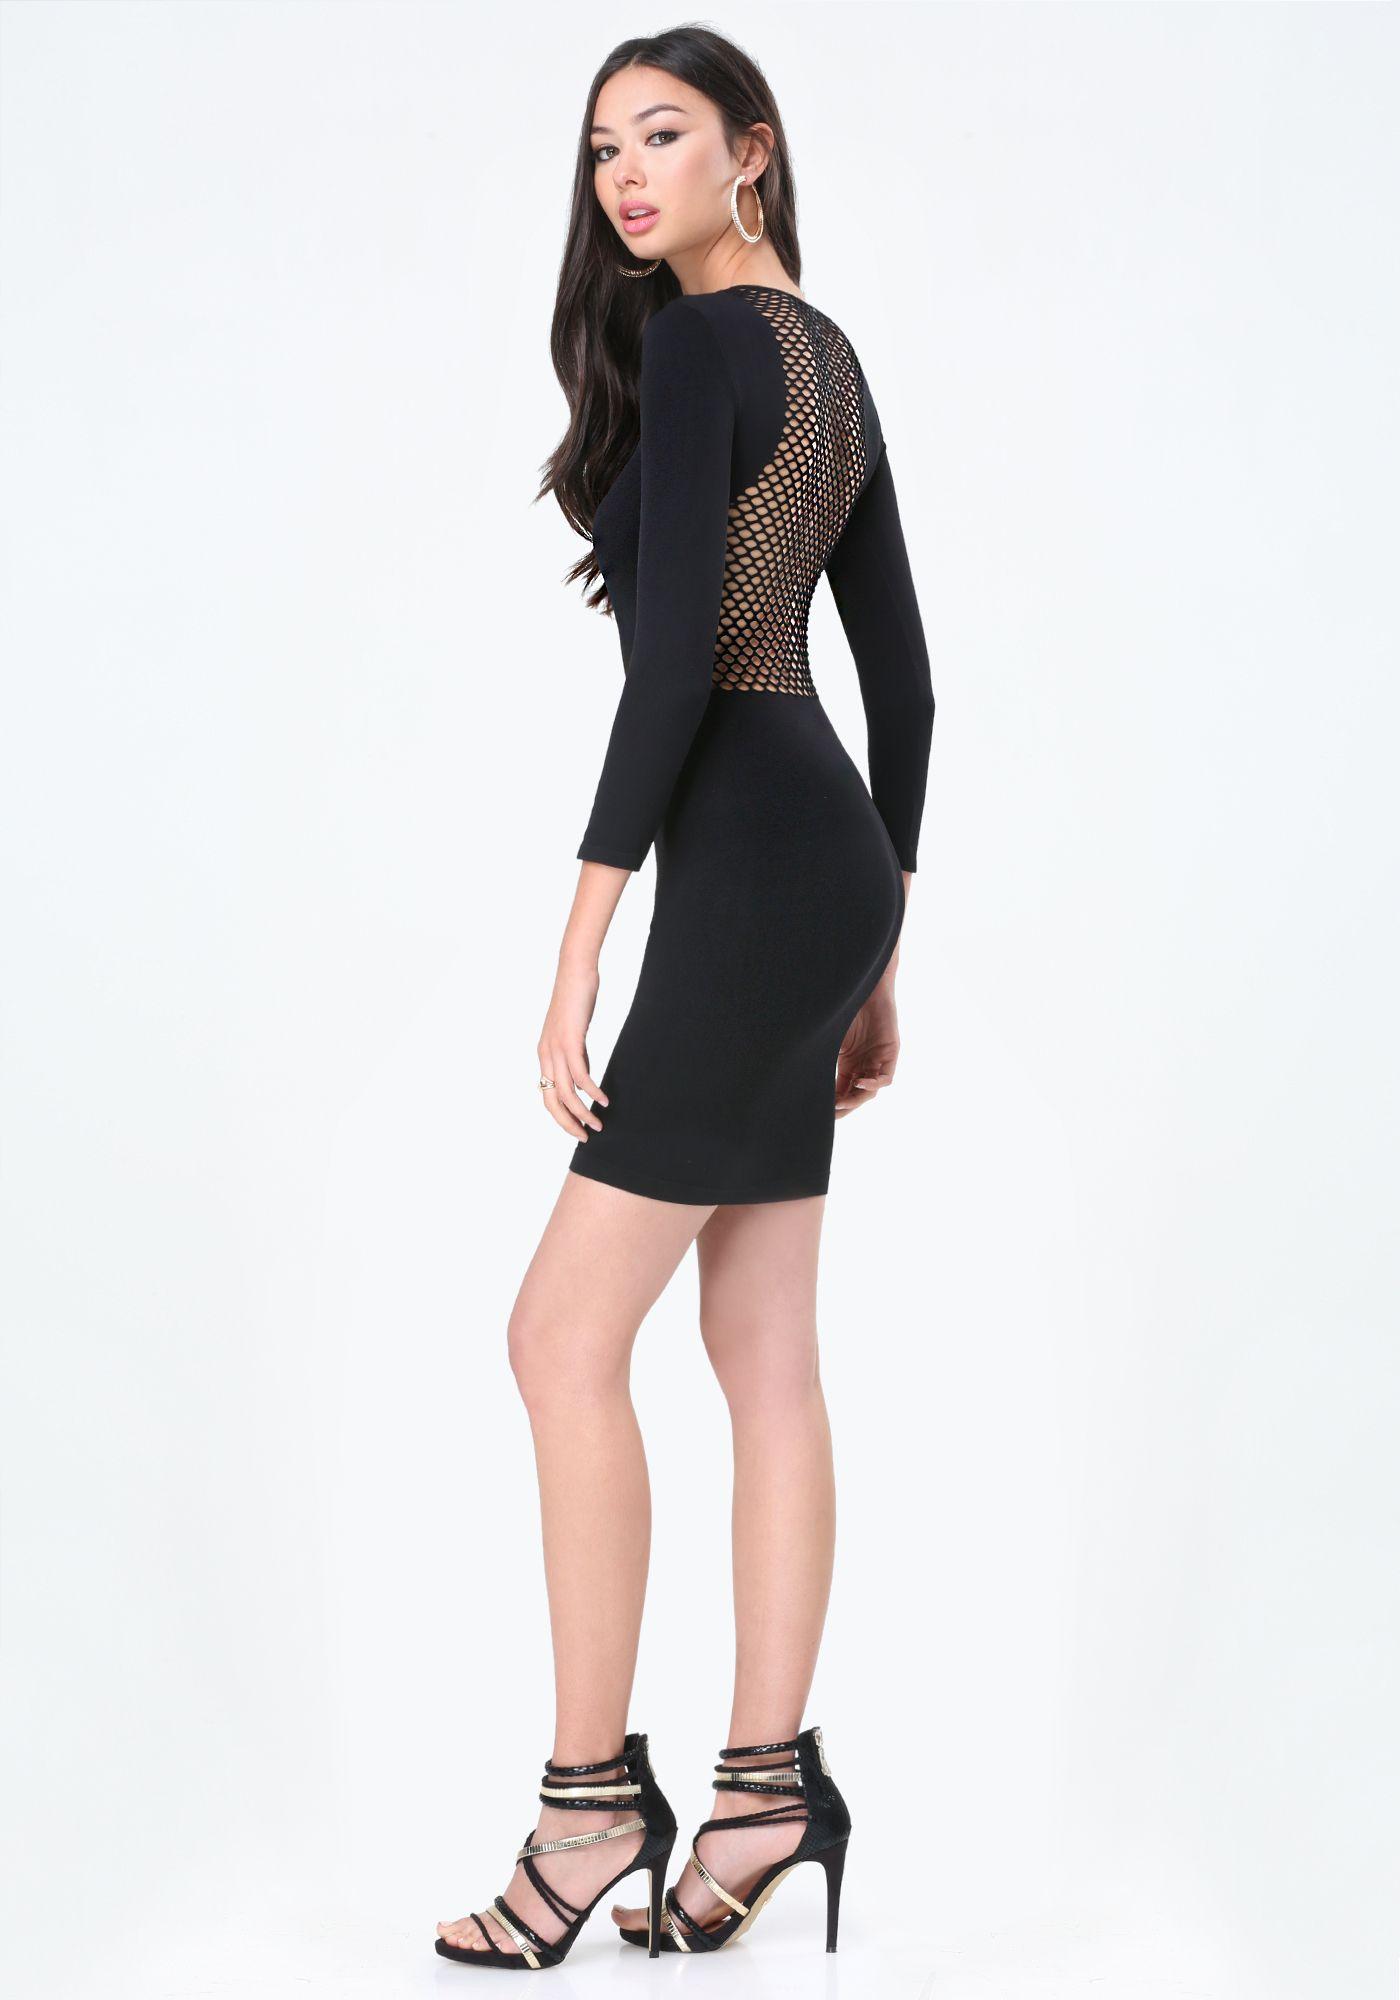 Bebe Jayme Mesh Back Dress In Black Bridget Hollitt Rbb 270005 Blk Bodycon Dress With Sleeves White Sheer Dress Clothes Design [ 2000 x 1400 Pixel ]